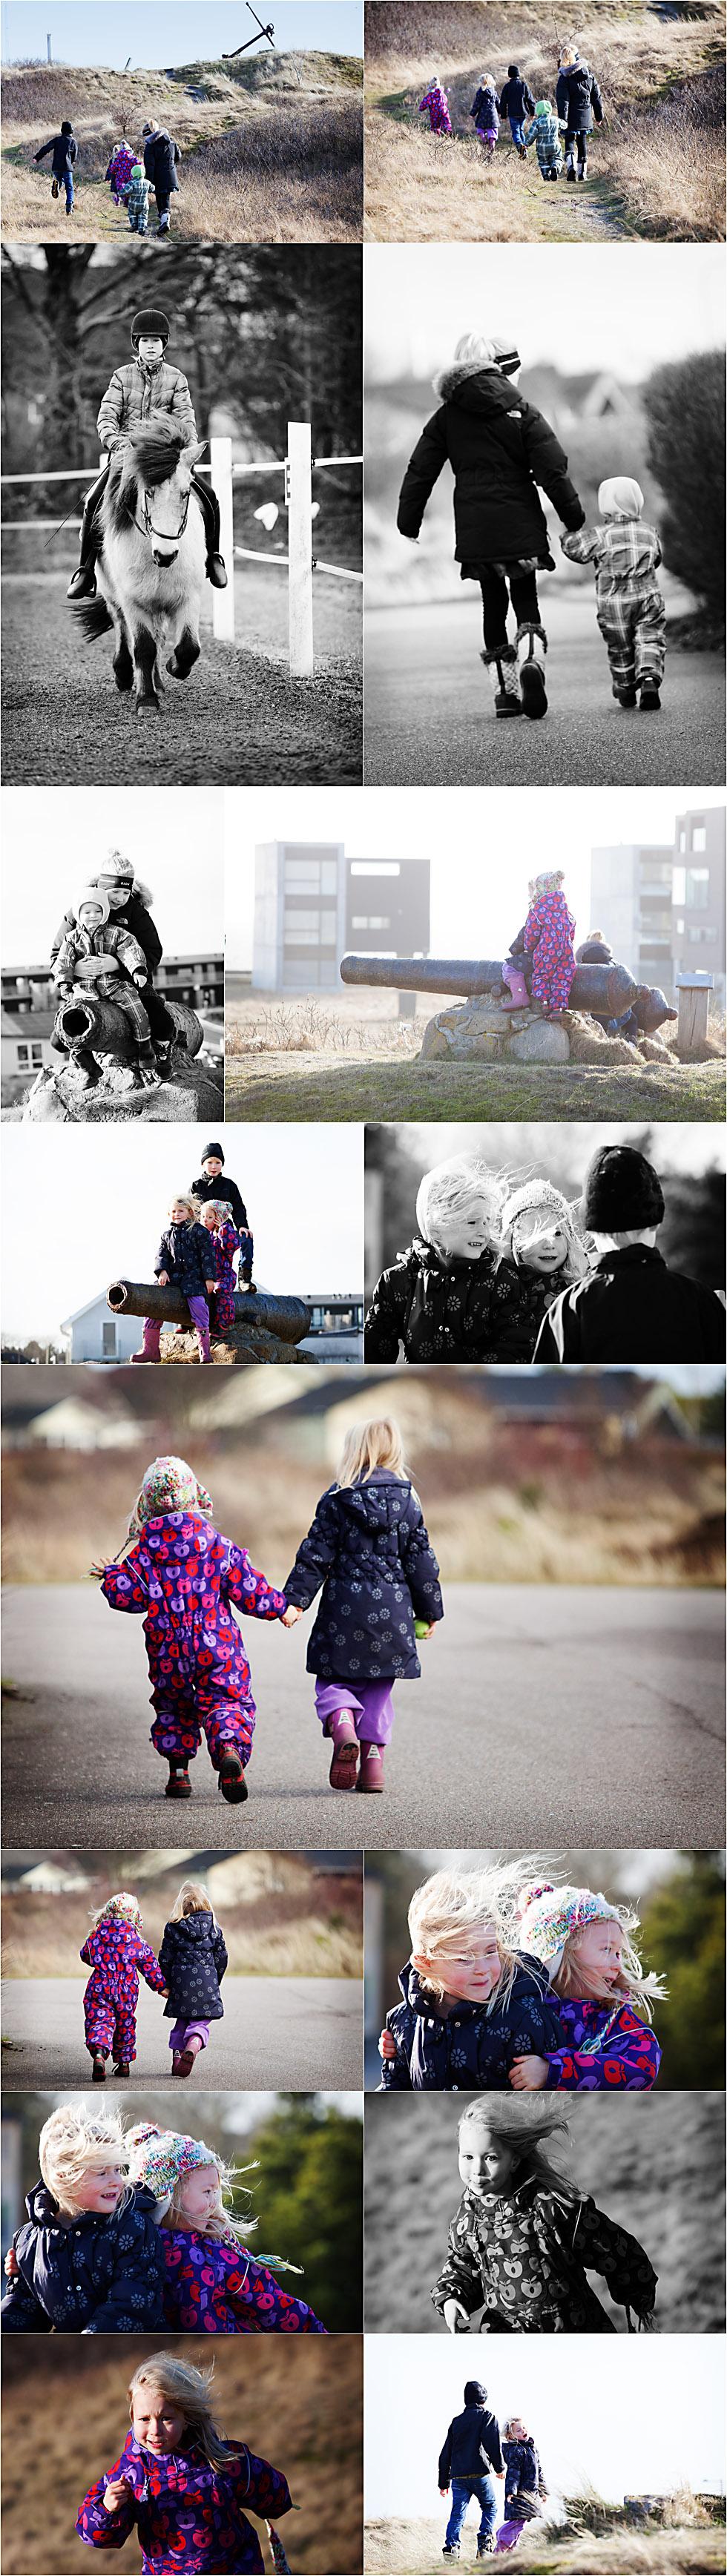 vinterferie collage